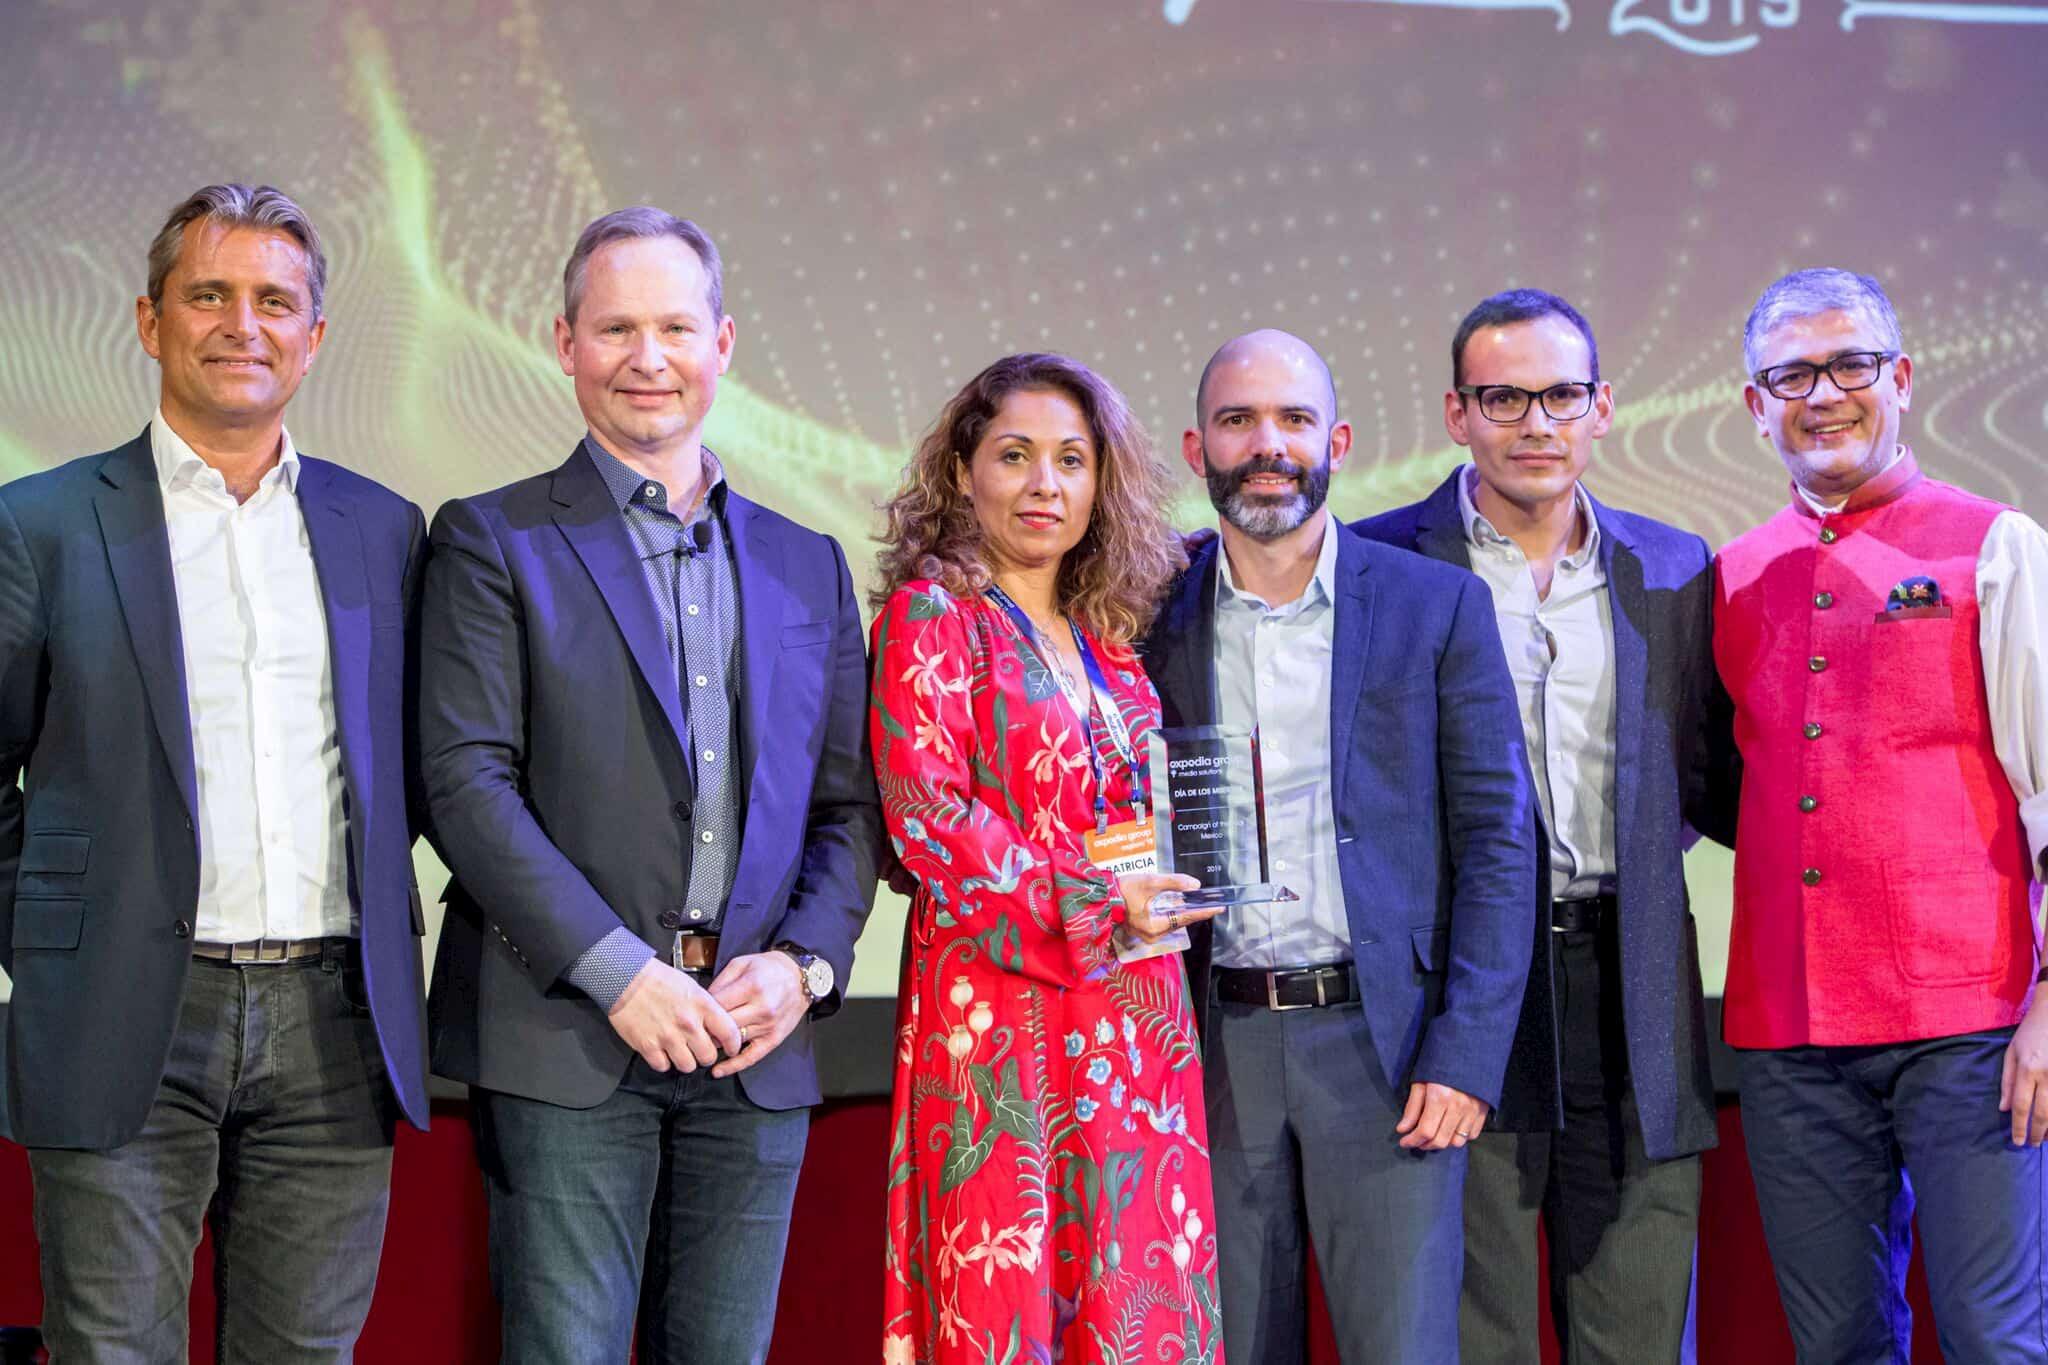 Dia de los Muertos_Partner_Awards_explore19_Expedia Group Media Solutions